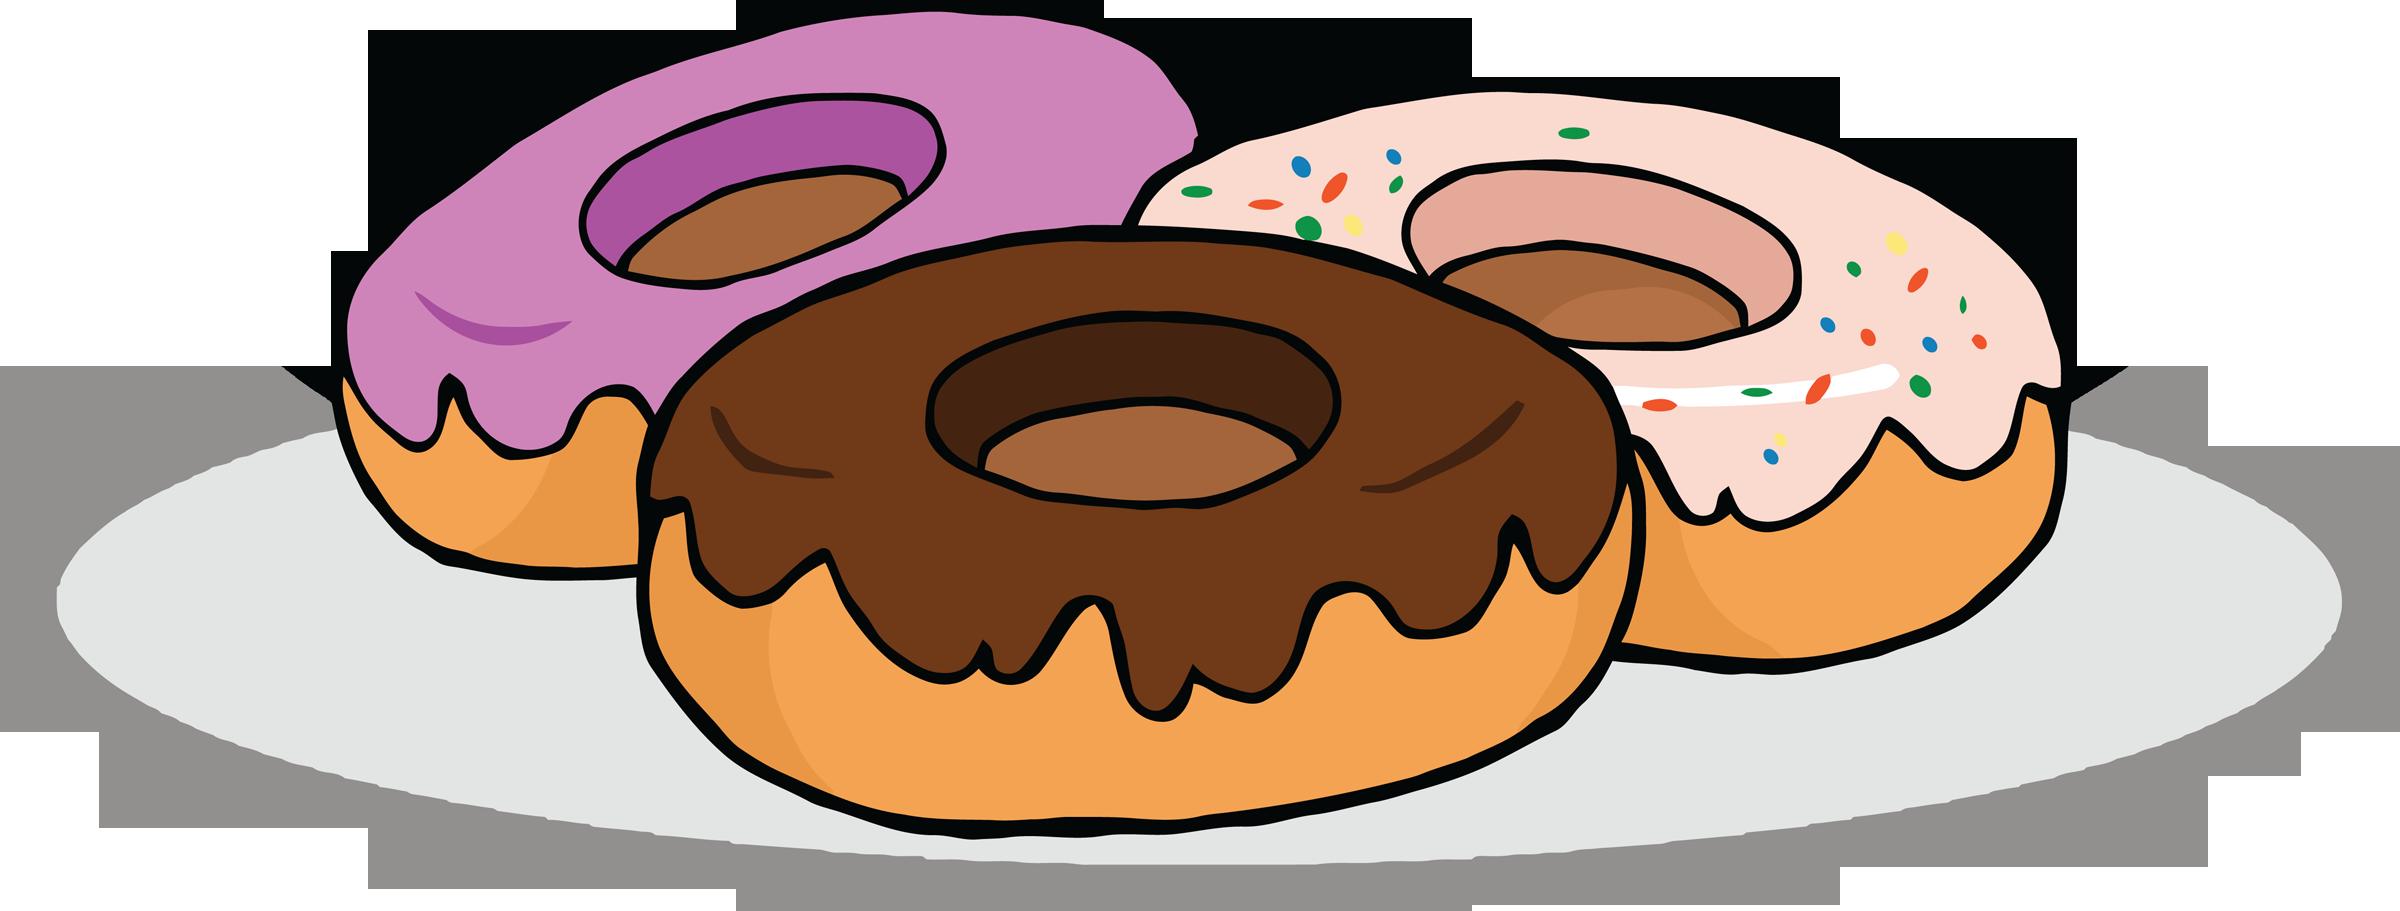 Doughnut clipart Cliparting free donut clip clipart